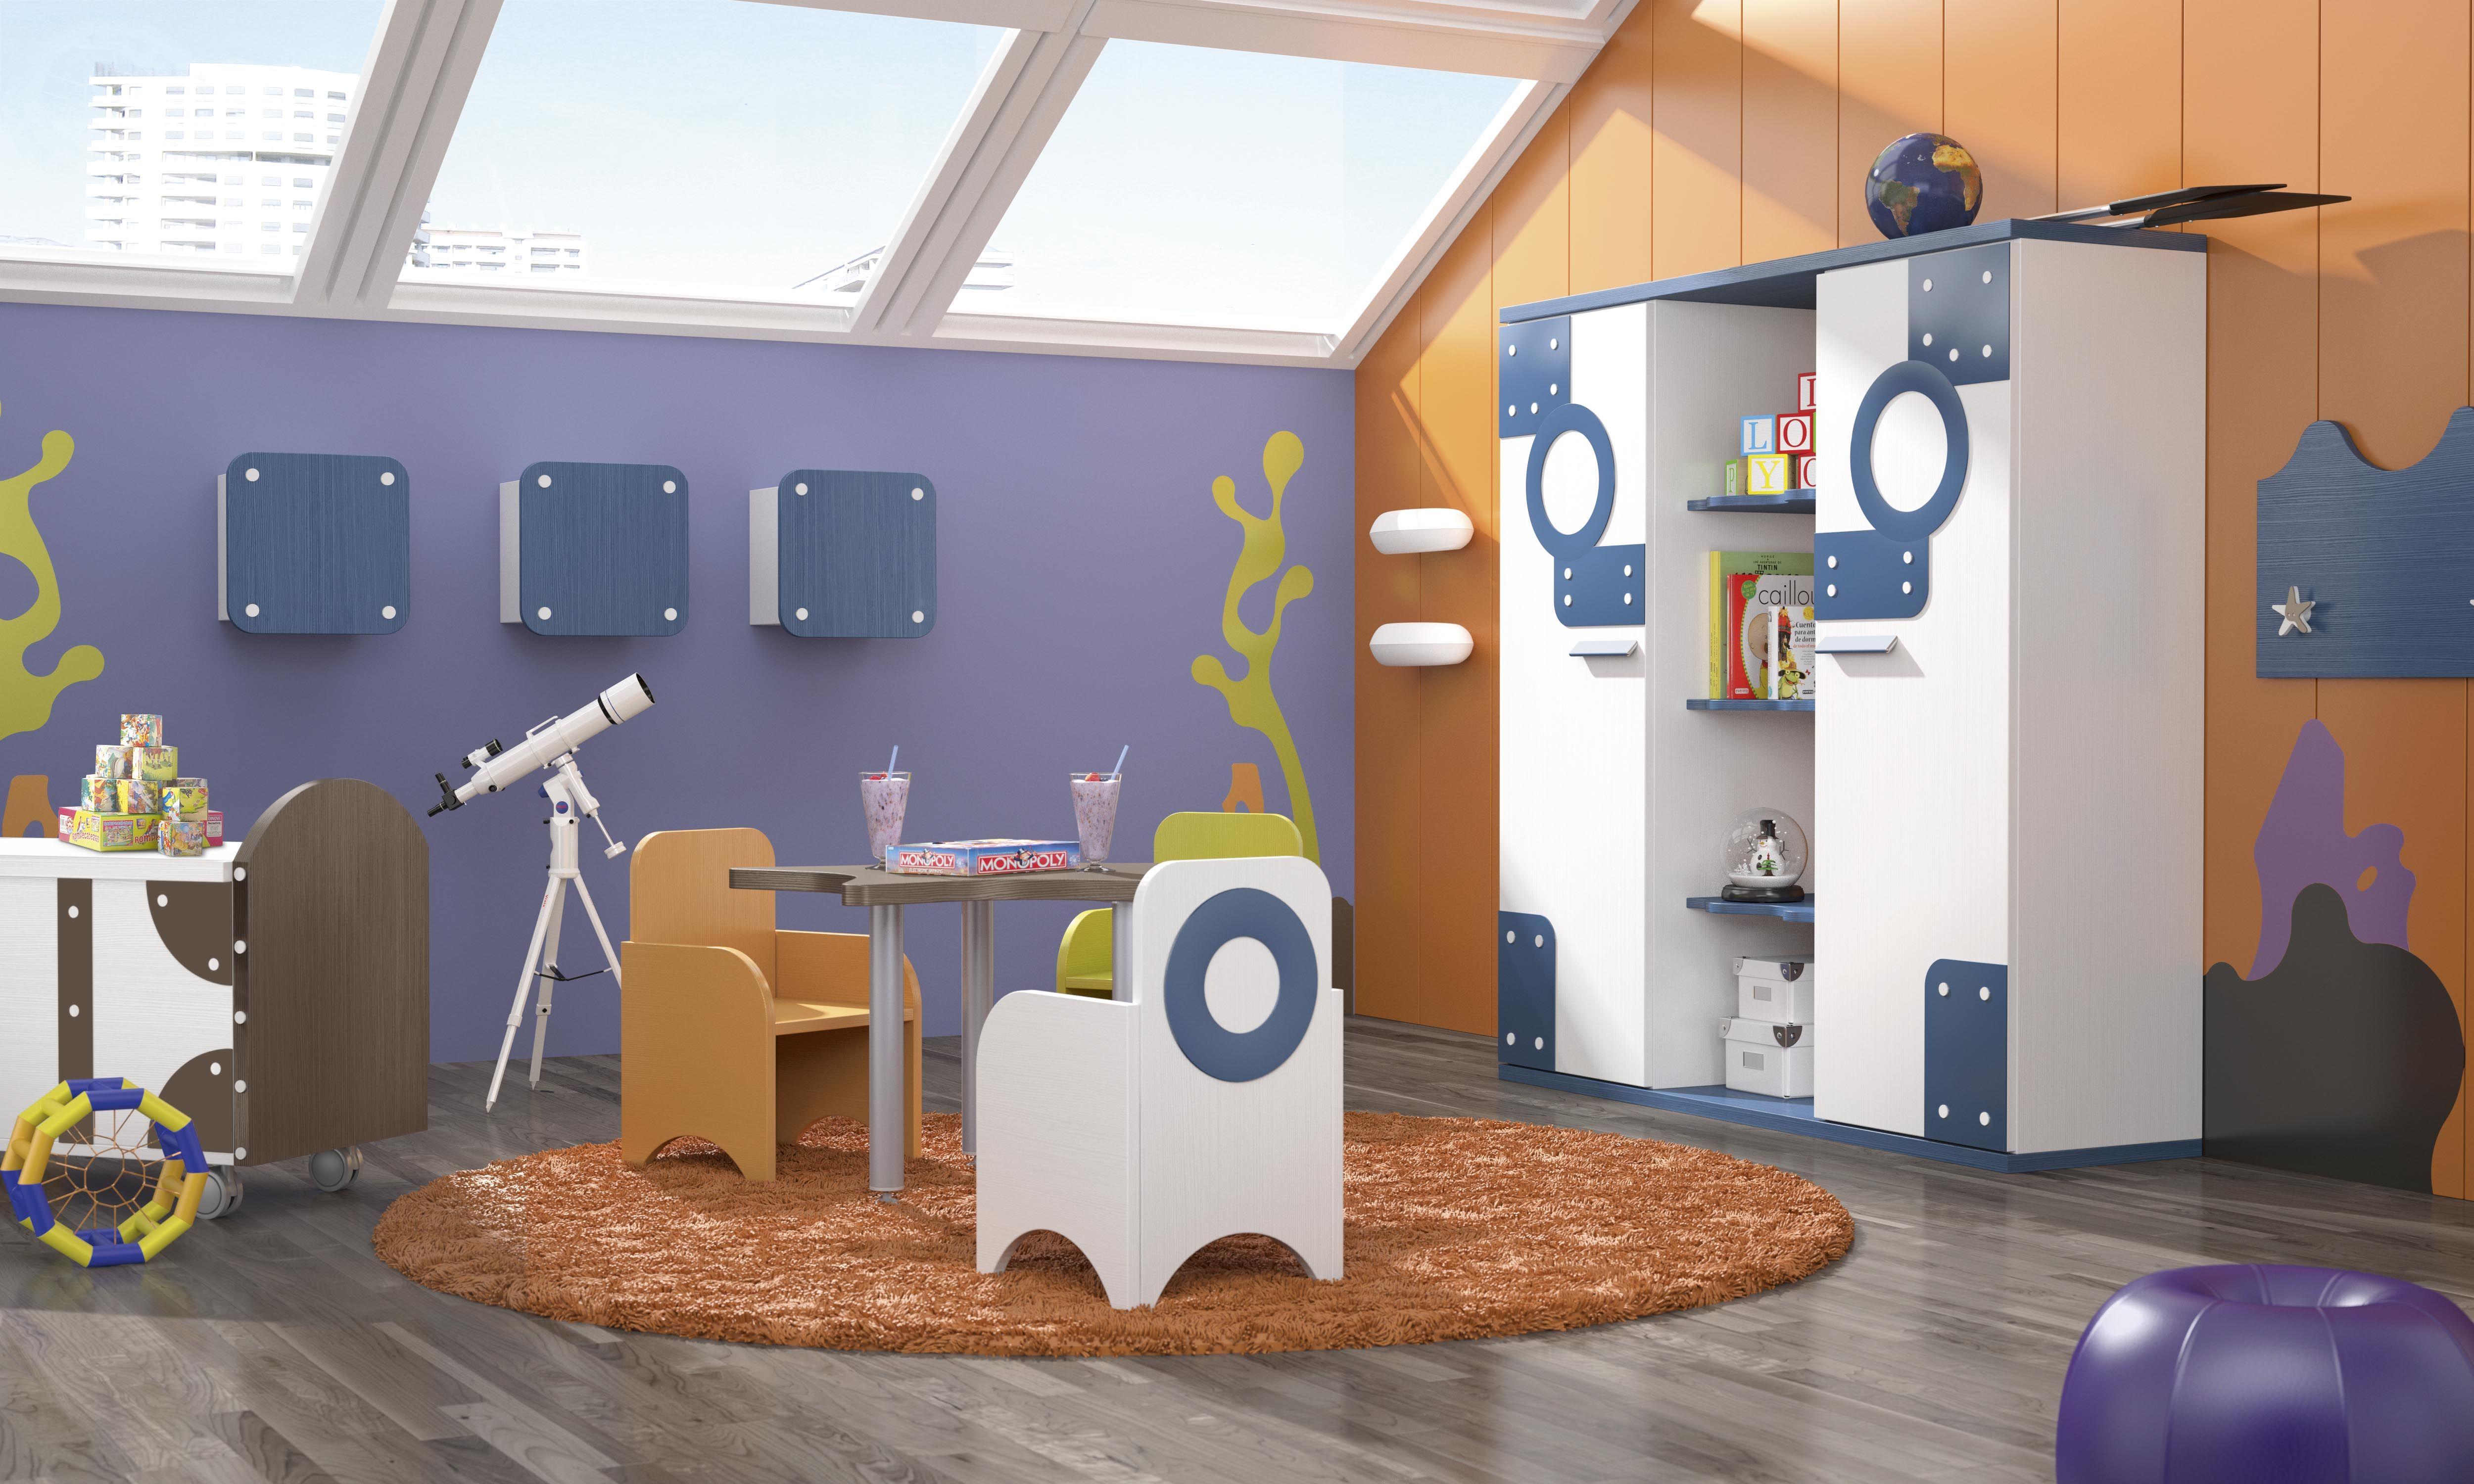 Habitaciones infantiles tem ticas dibujos animados bob7 kids pinterest habitaci n infantil - Habitaciones infantiles tematicas ...